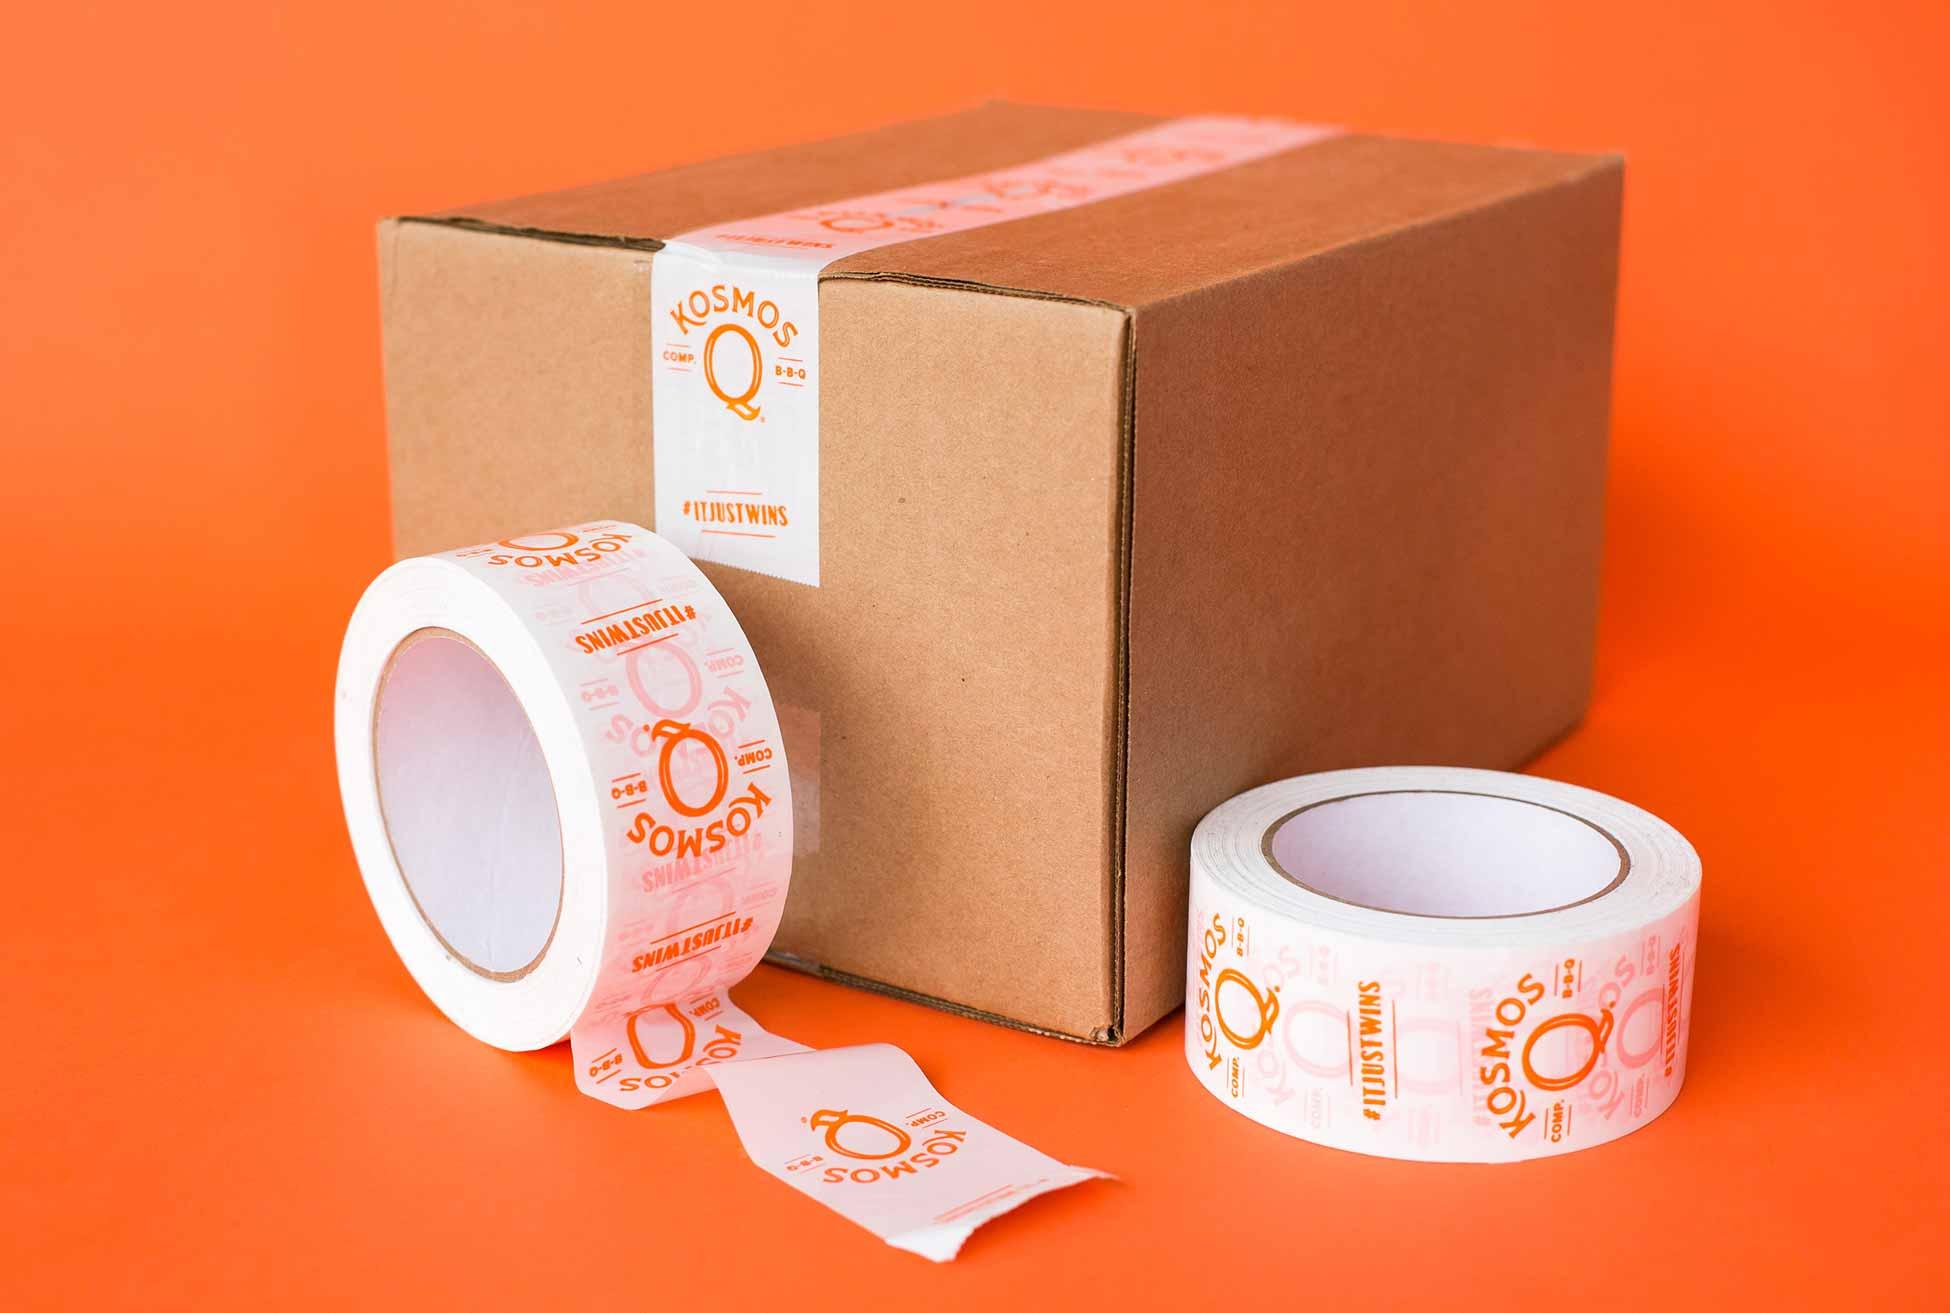 kosmosq_packing-tape.jpg